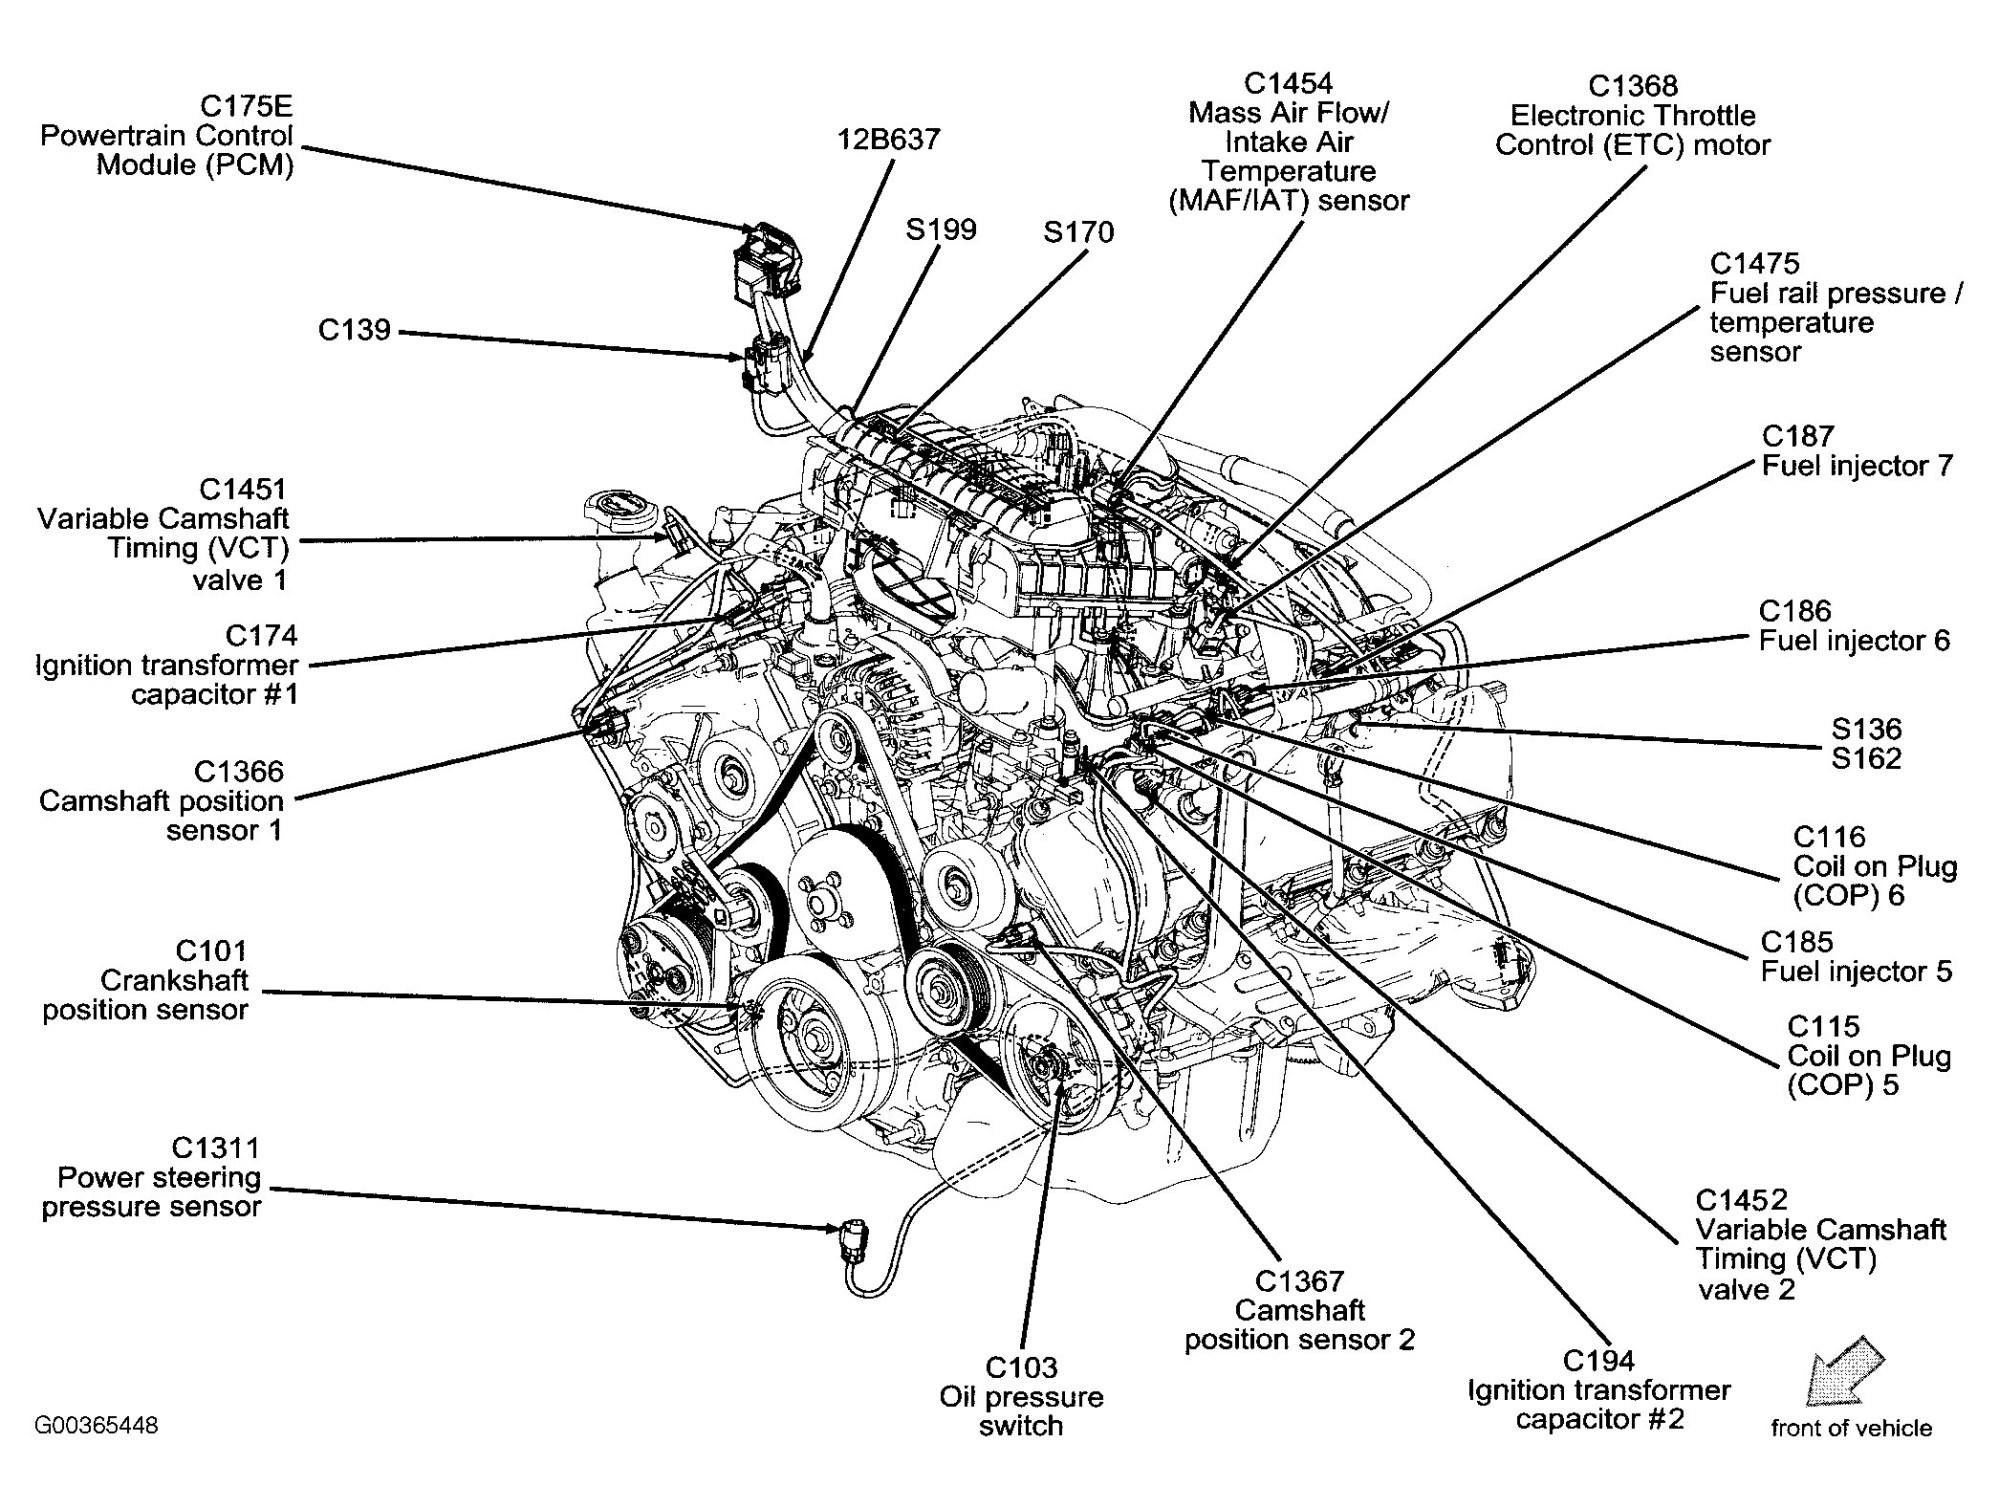 hight resolution of 2006 ford 3 0 v6 engine diagram u2022 wiring diagram for free ford 3 0 v6 engine